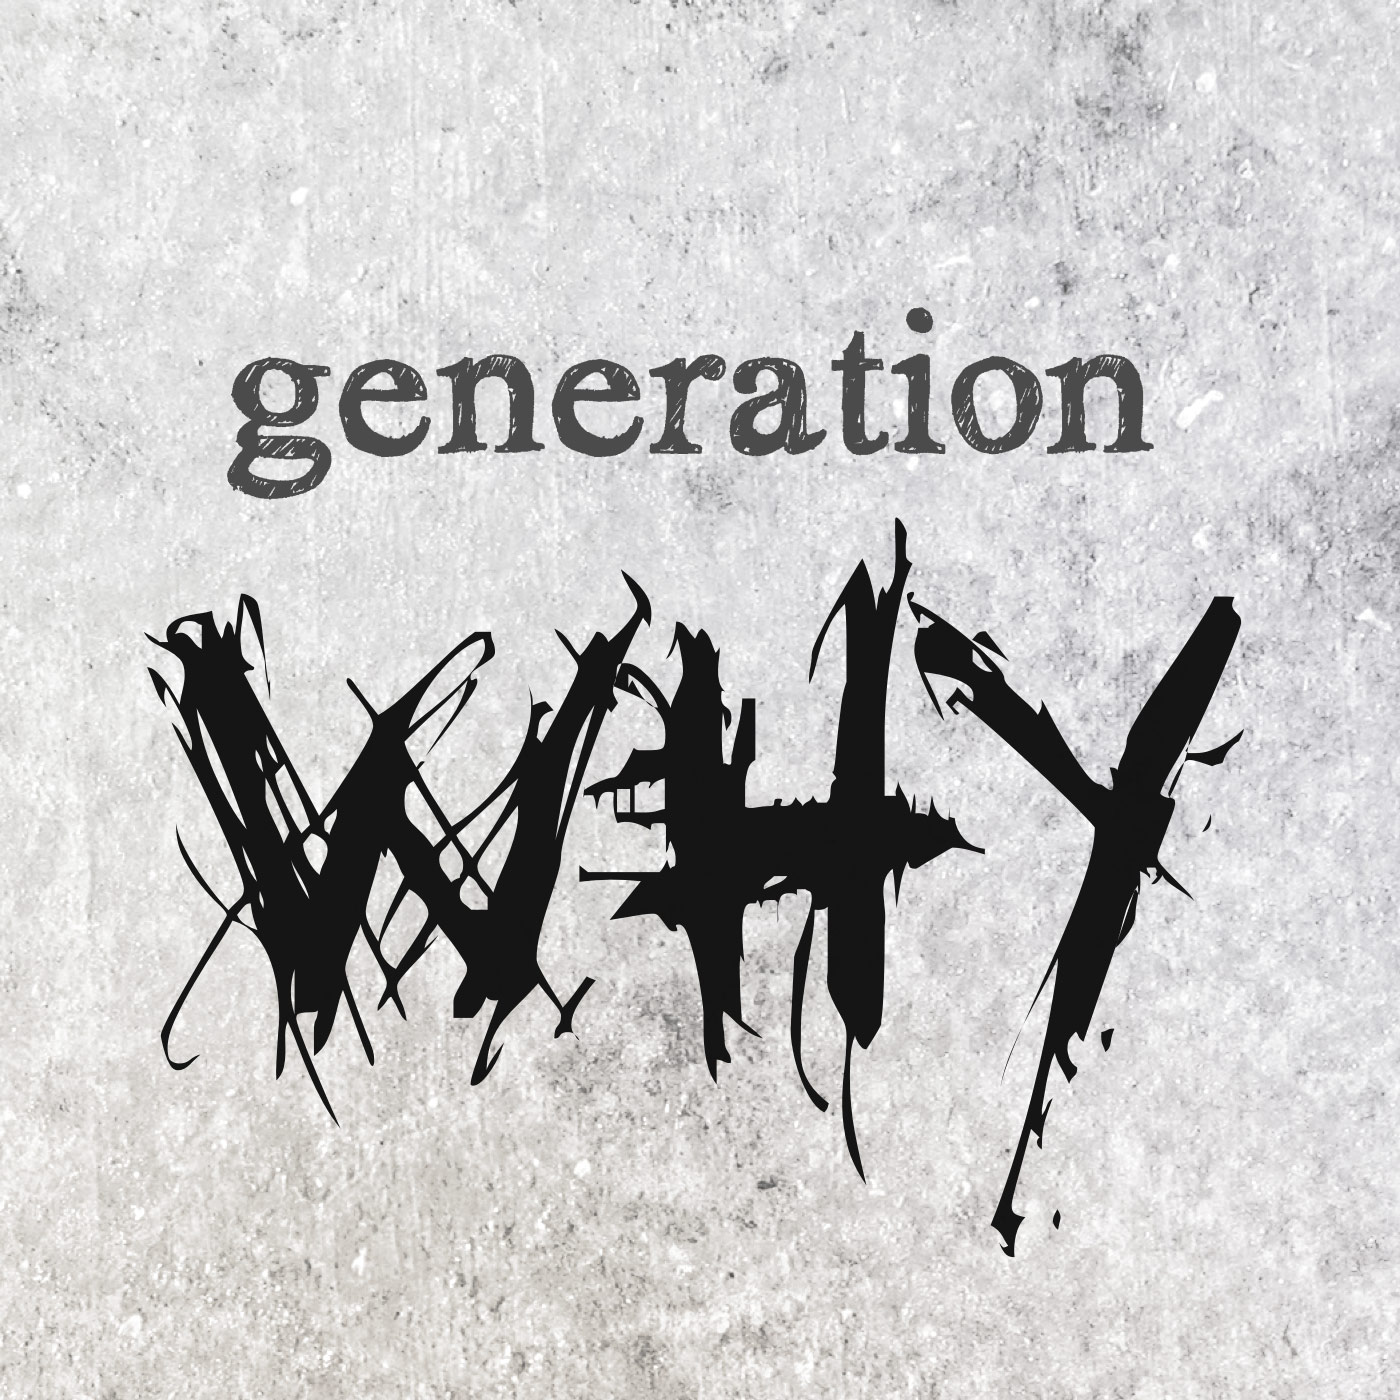 generation why.jpg